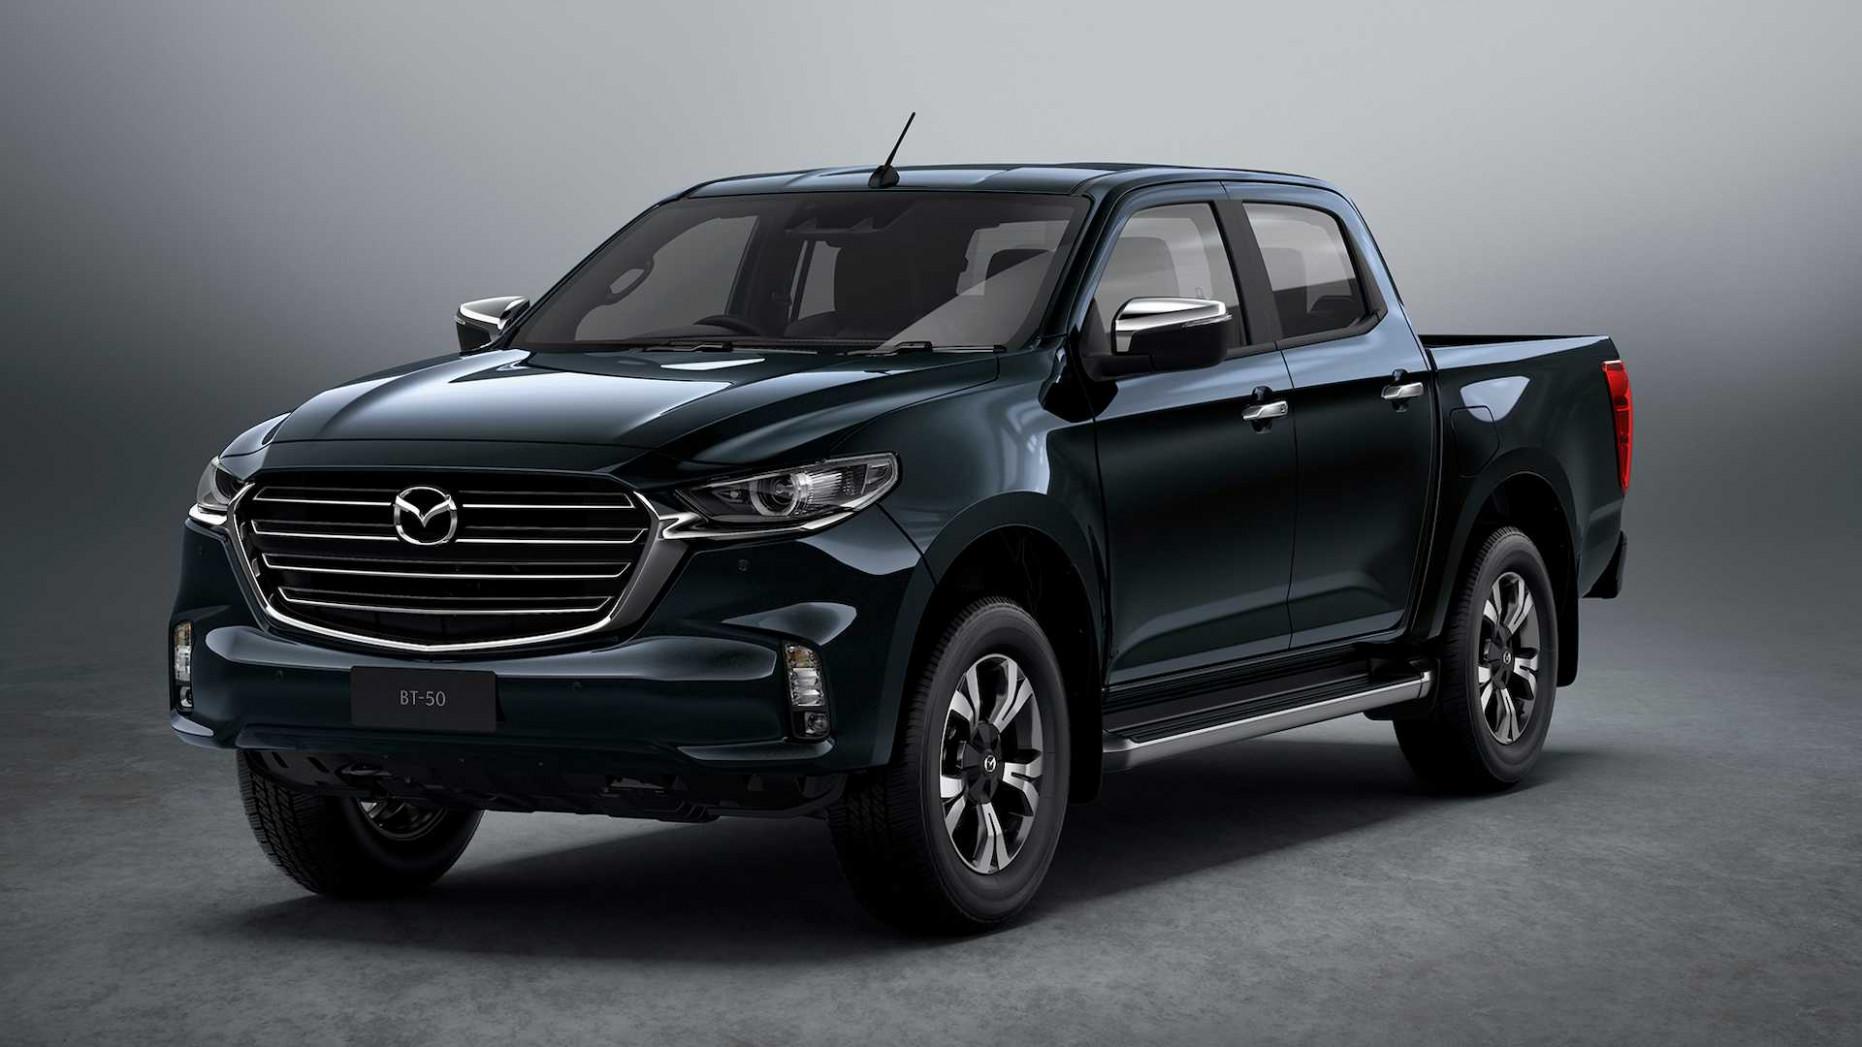 Reviews Mazda Bt 50 2022 Model